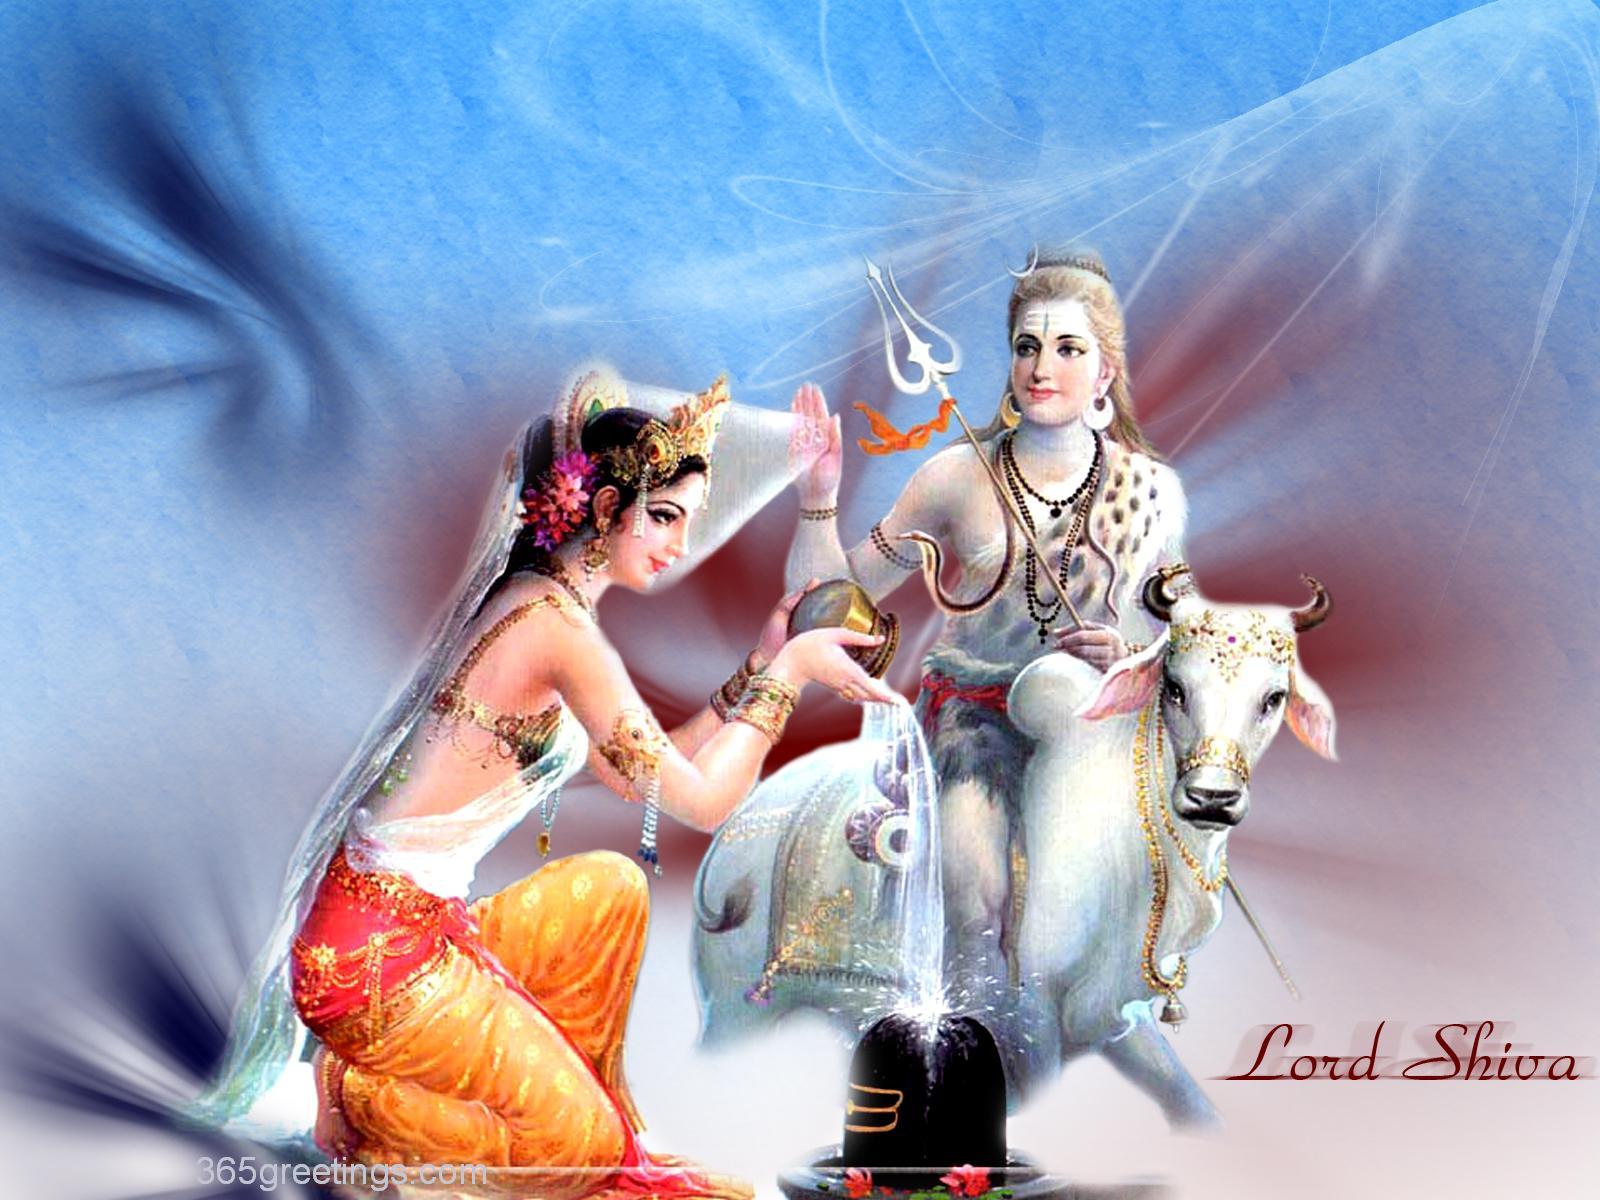 Amazing Lord Shiva Wallpapers: Lord Shiva